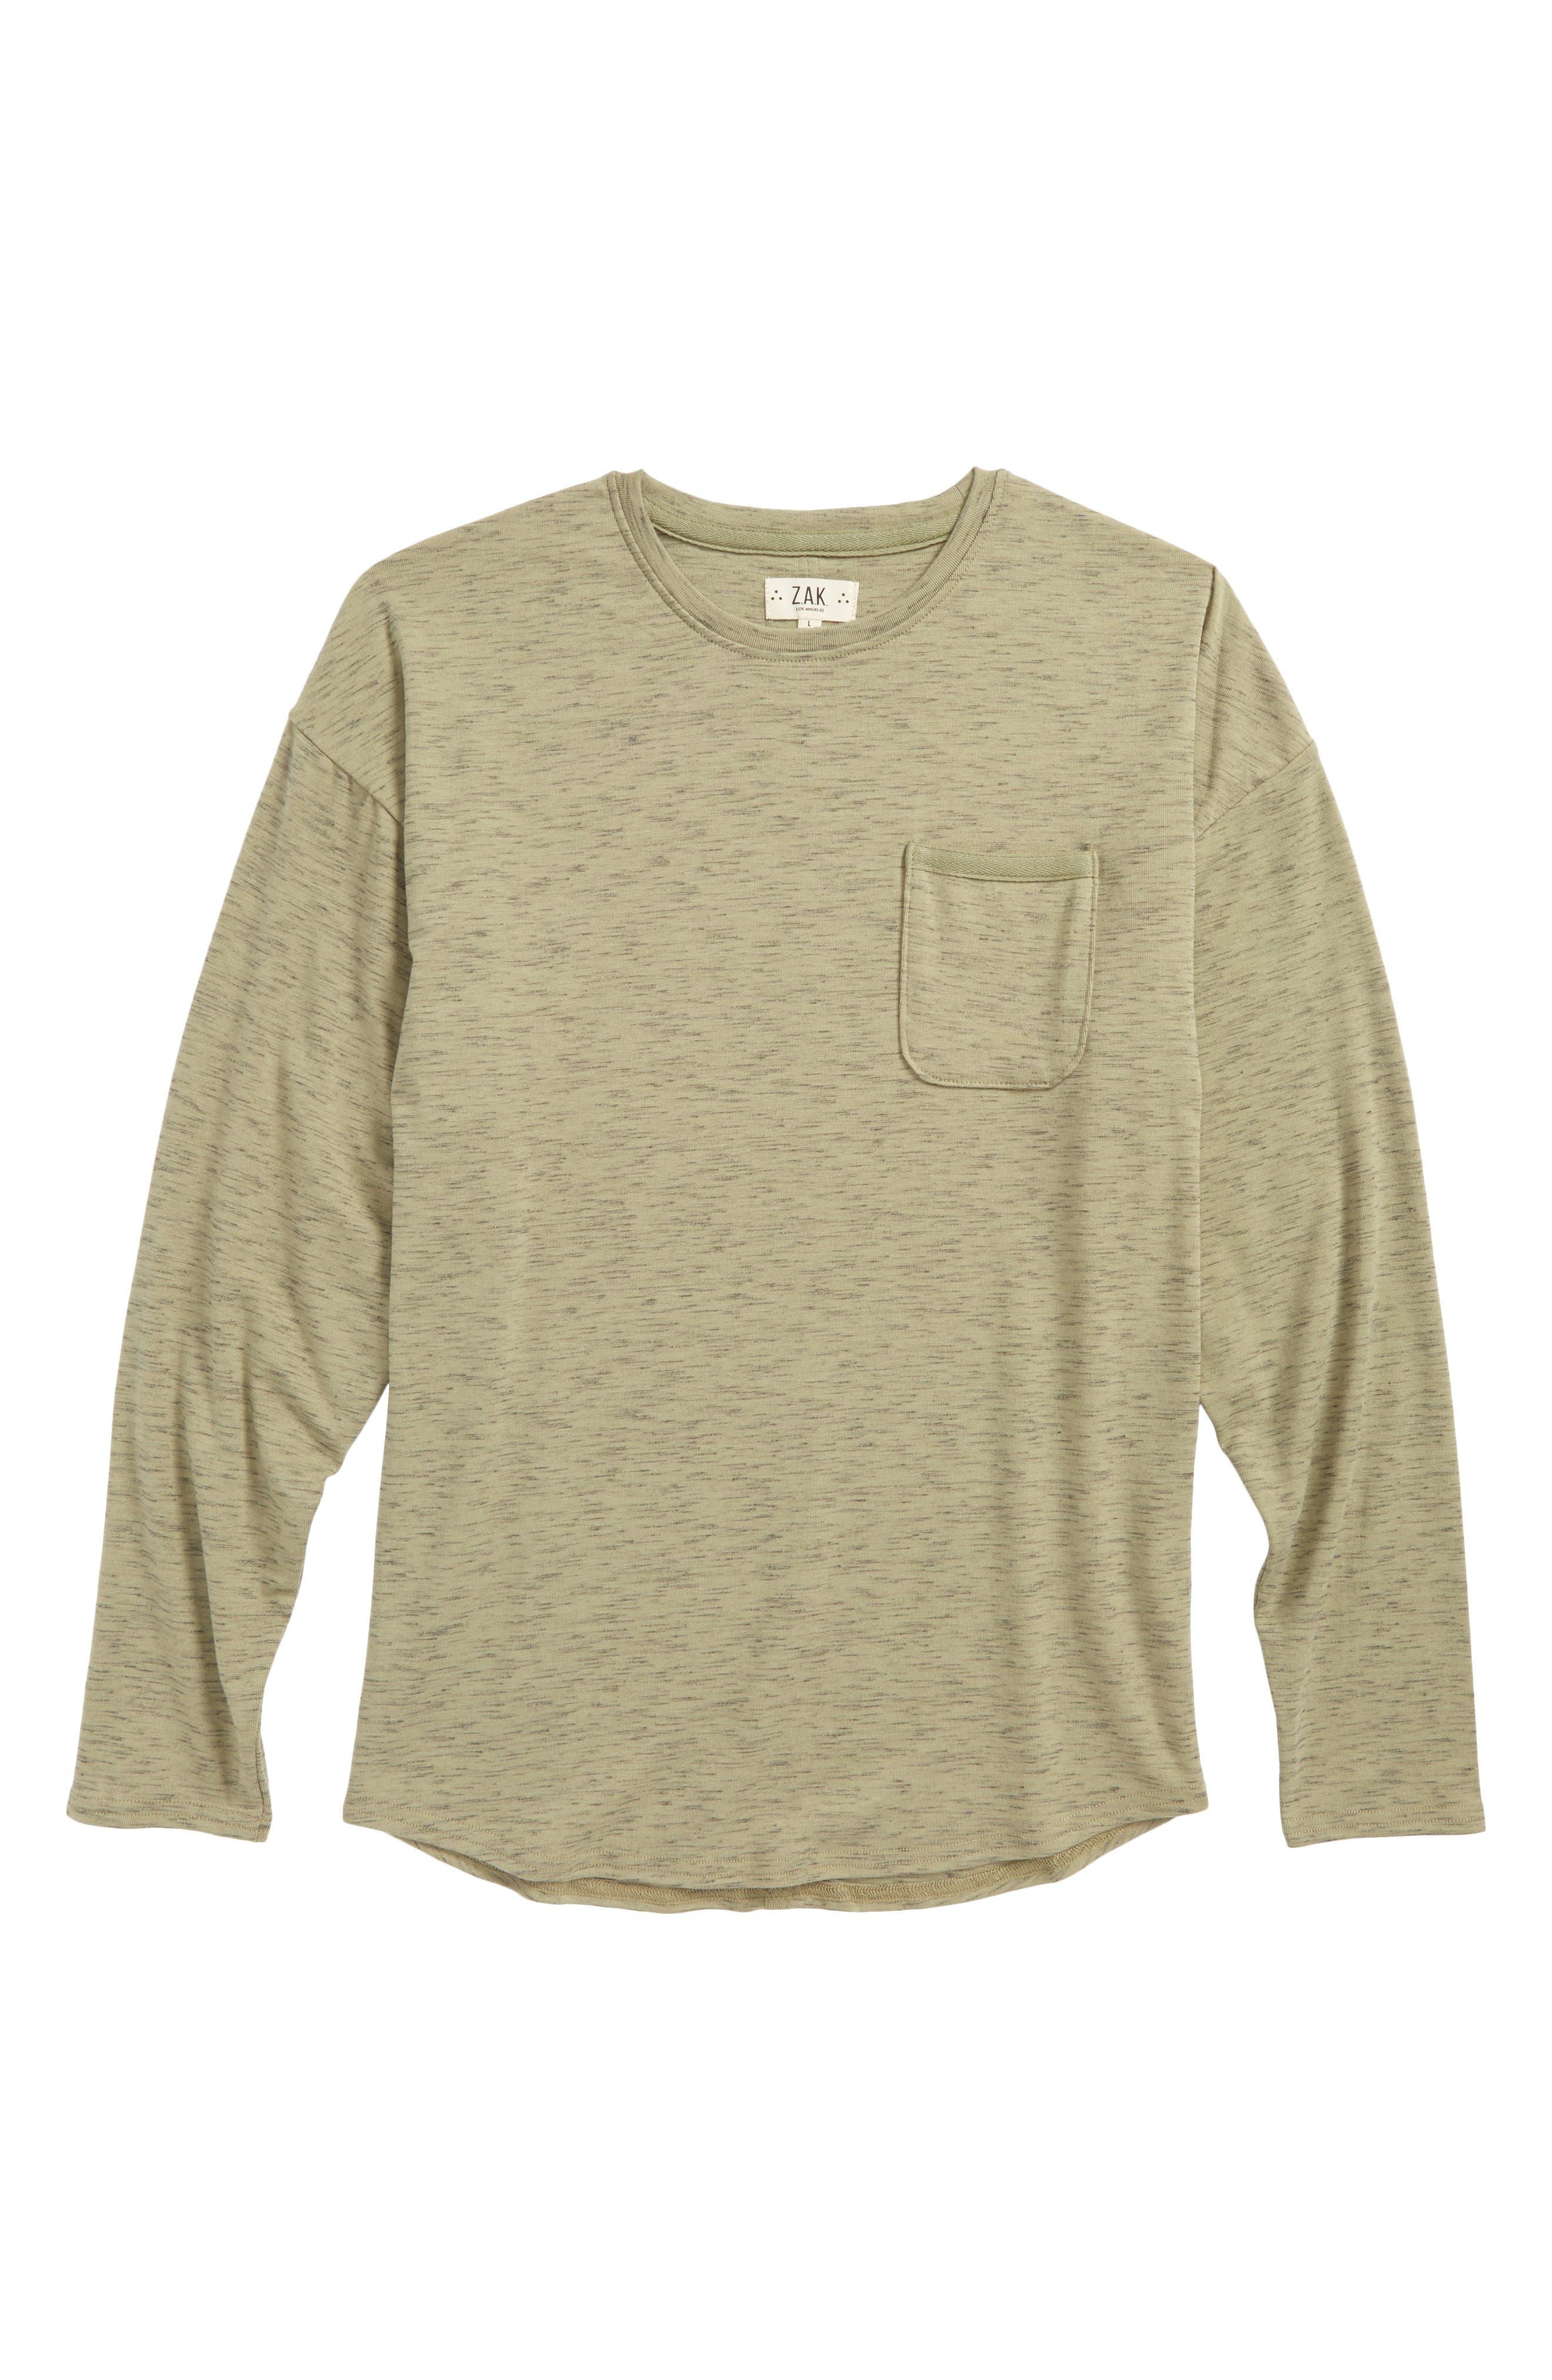 Z.A.K. Brand The Mason Pocket T-Shirt (Big Boys)